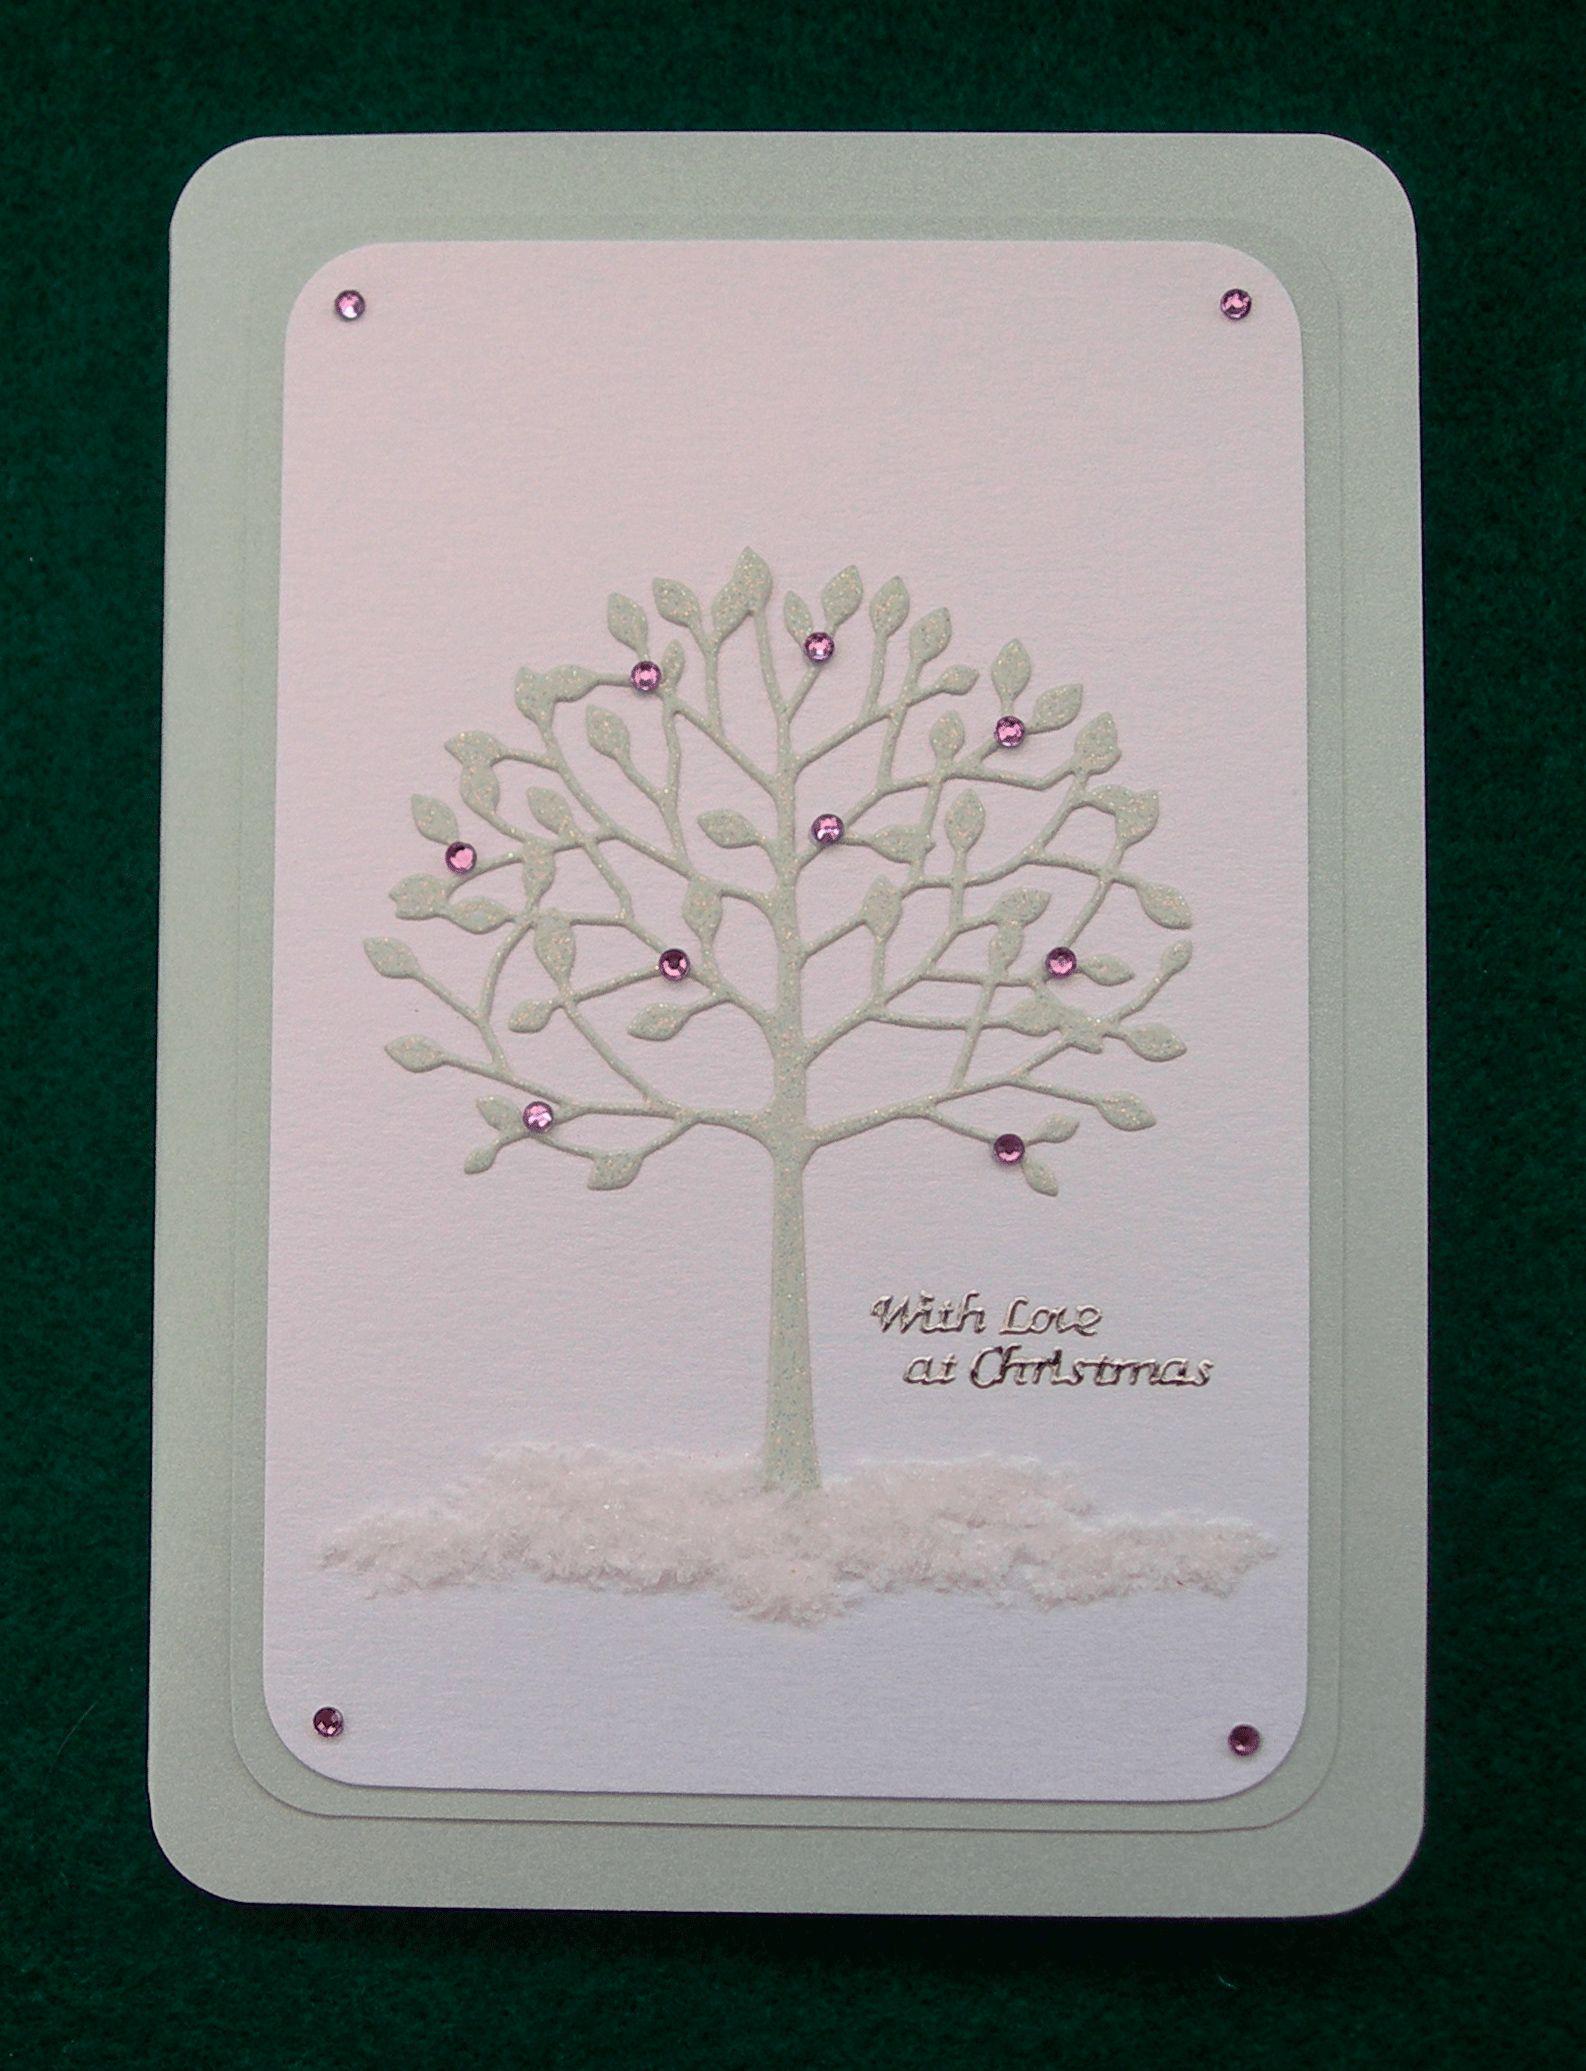 Xgx2013 Mb Arboscello Tree I Used Flower Soft Polar White At The